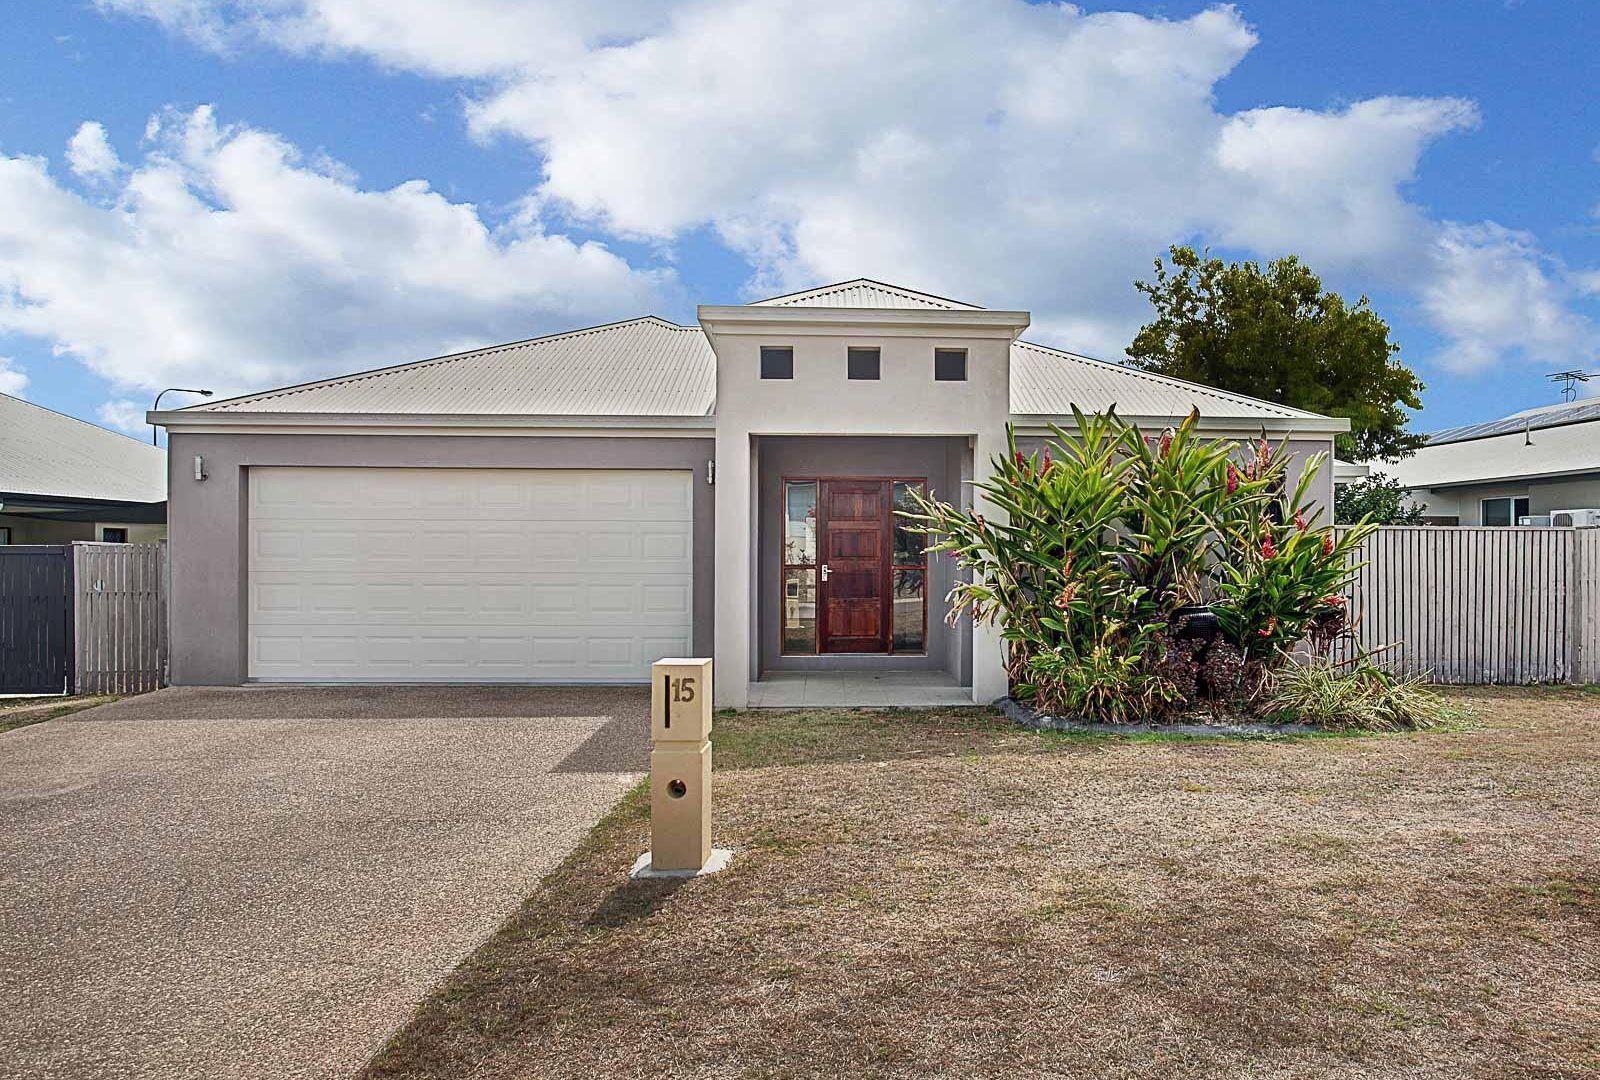 15 Shutehaven Circuit, Bushland Beach QLD 4818, Image 6